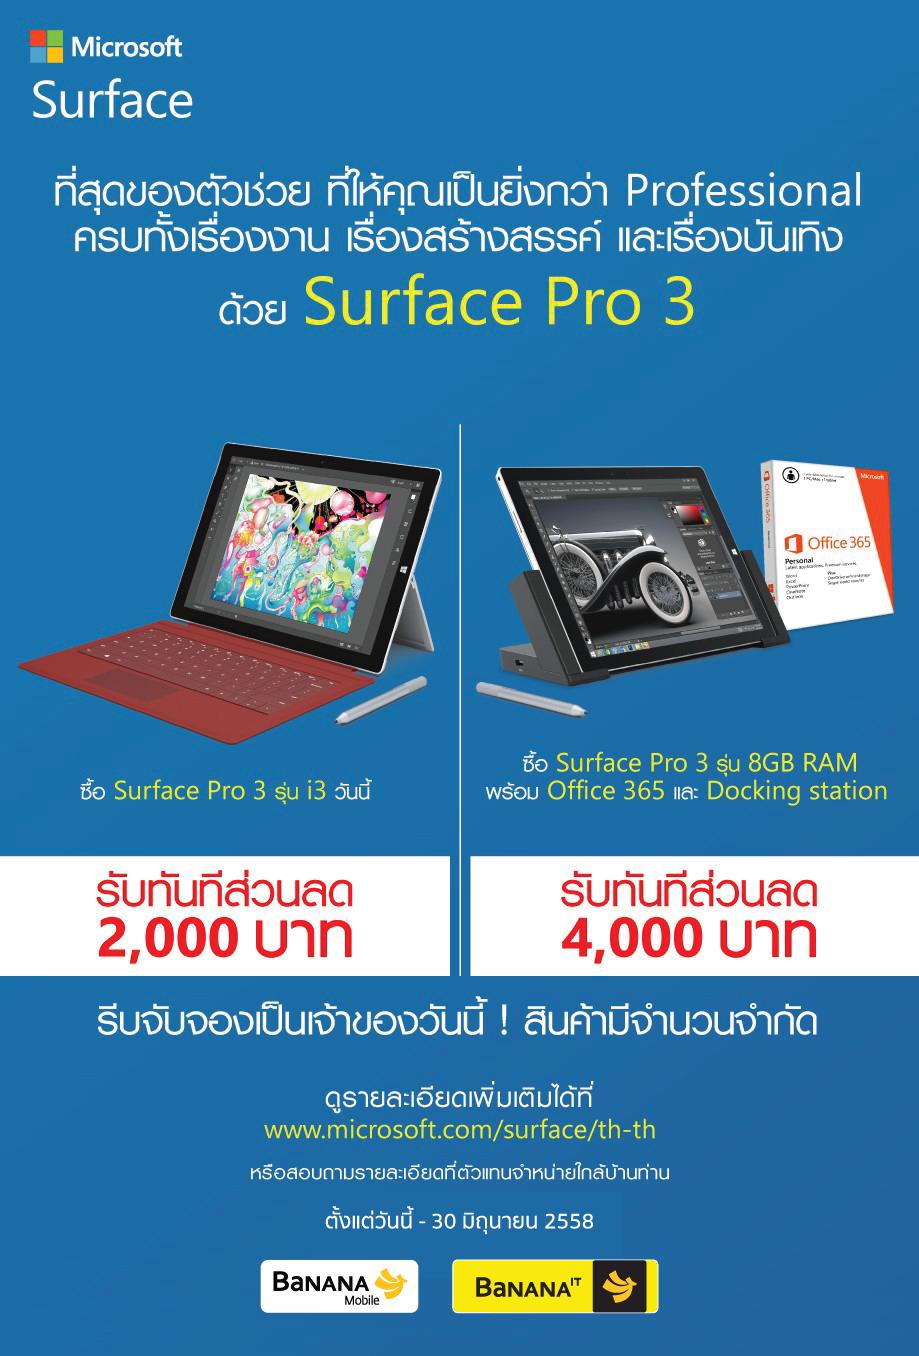 Surface Pro 3 ลด 4,000